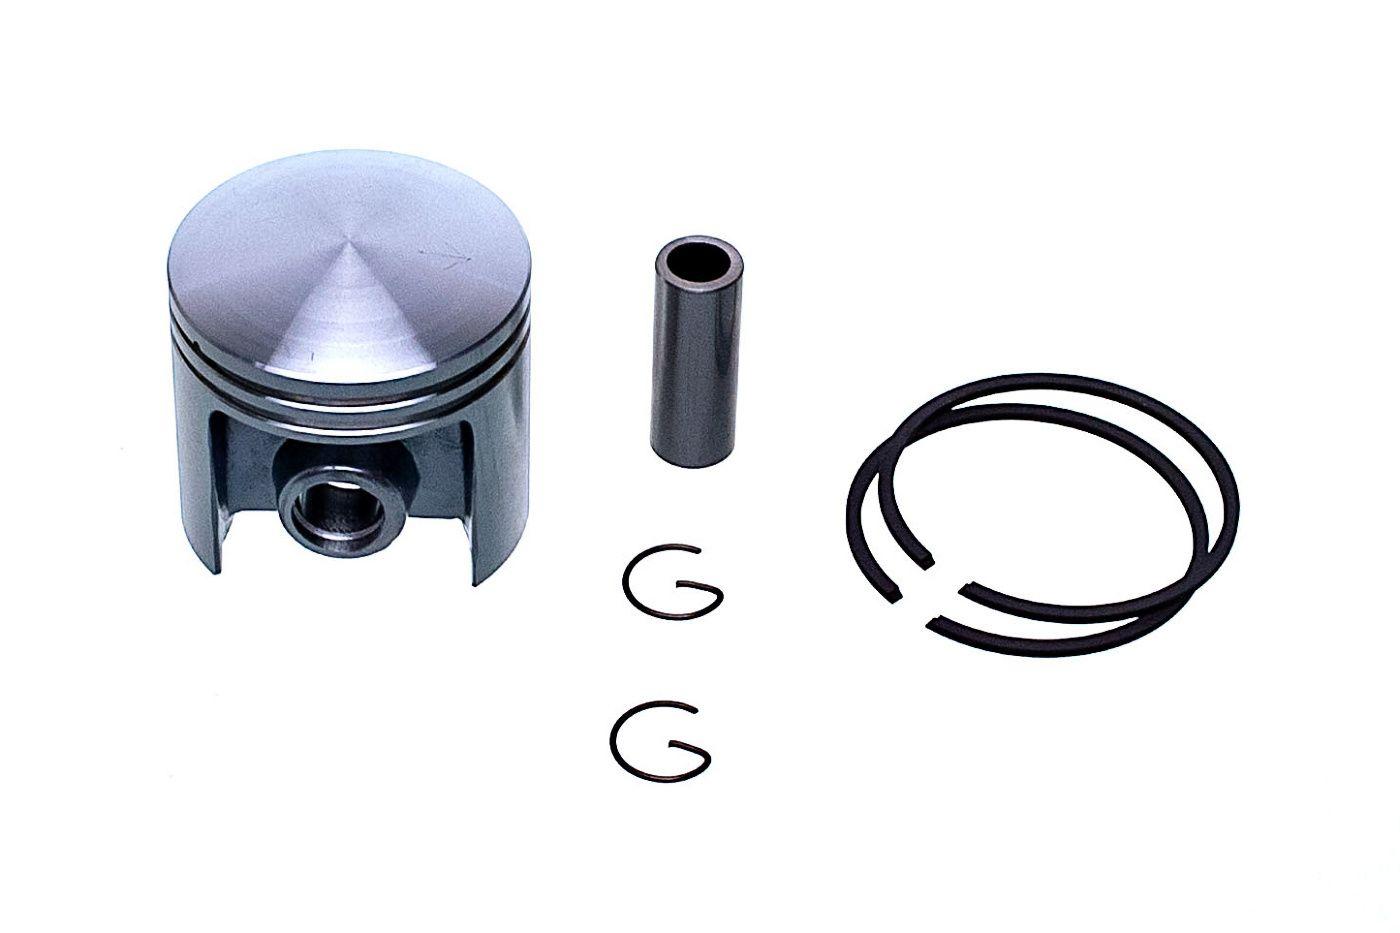 Piest pro Stihl 08S TS350 - 47 mm